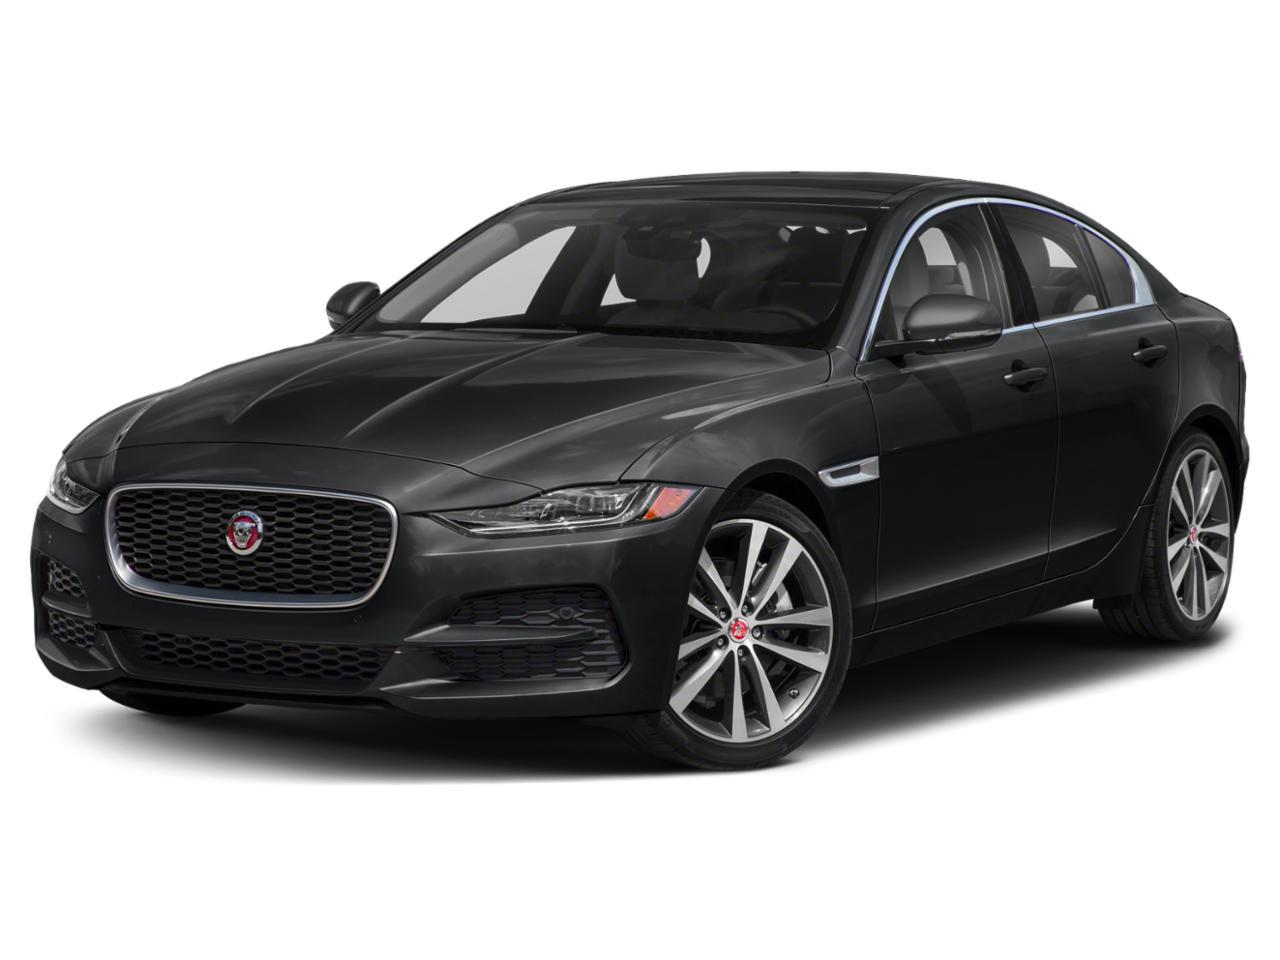 2020 Jaguar XE Vehicle Photo in Charlotte, NC 28227